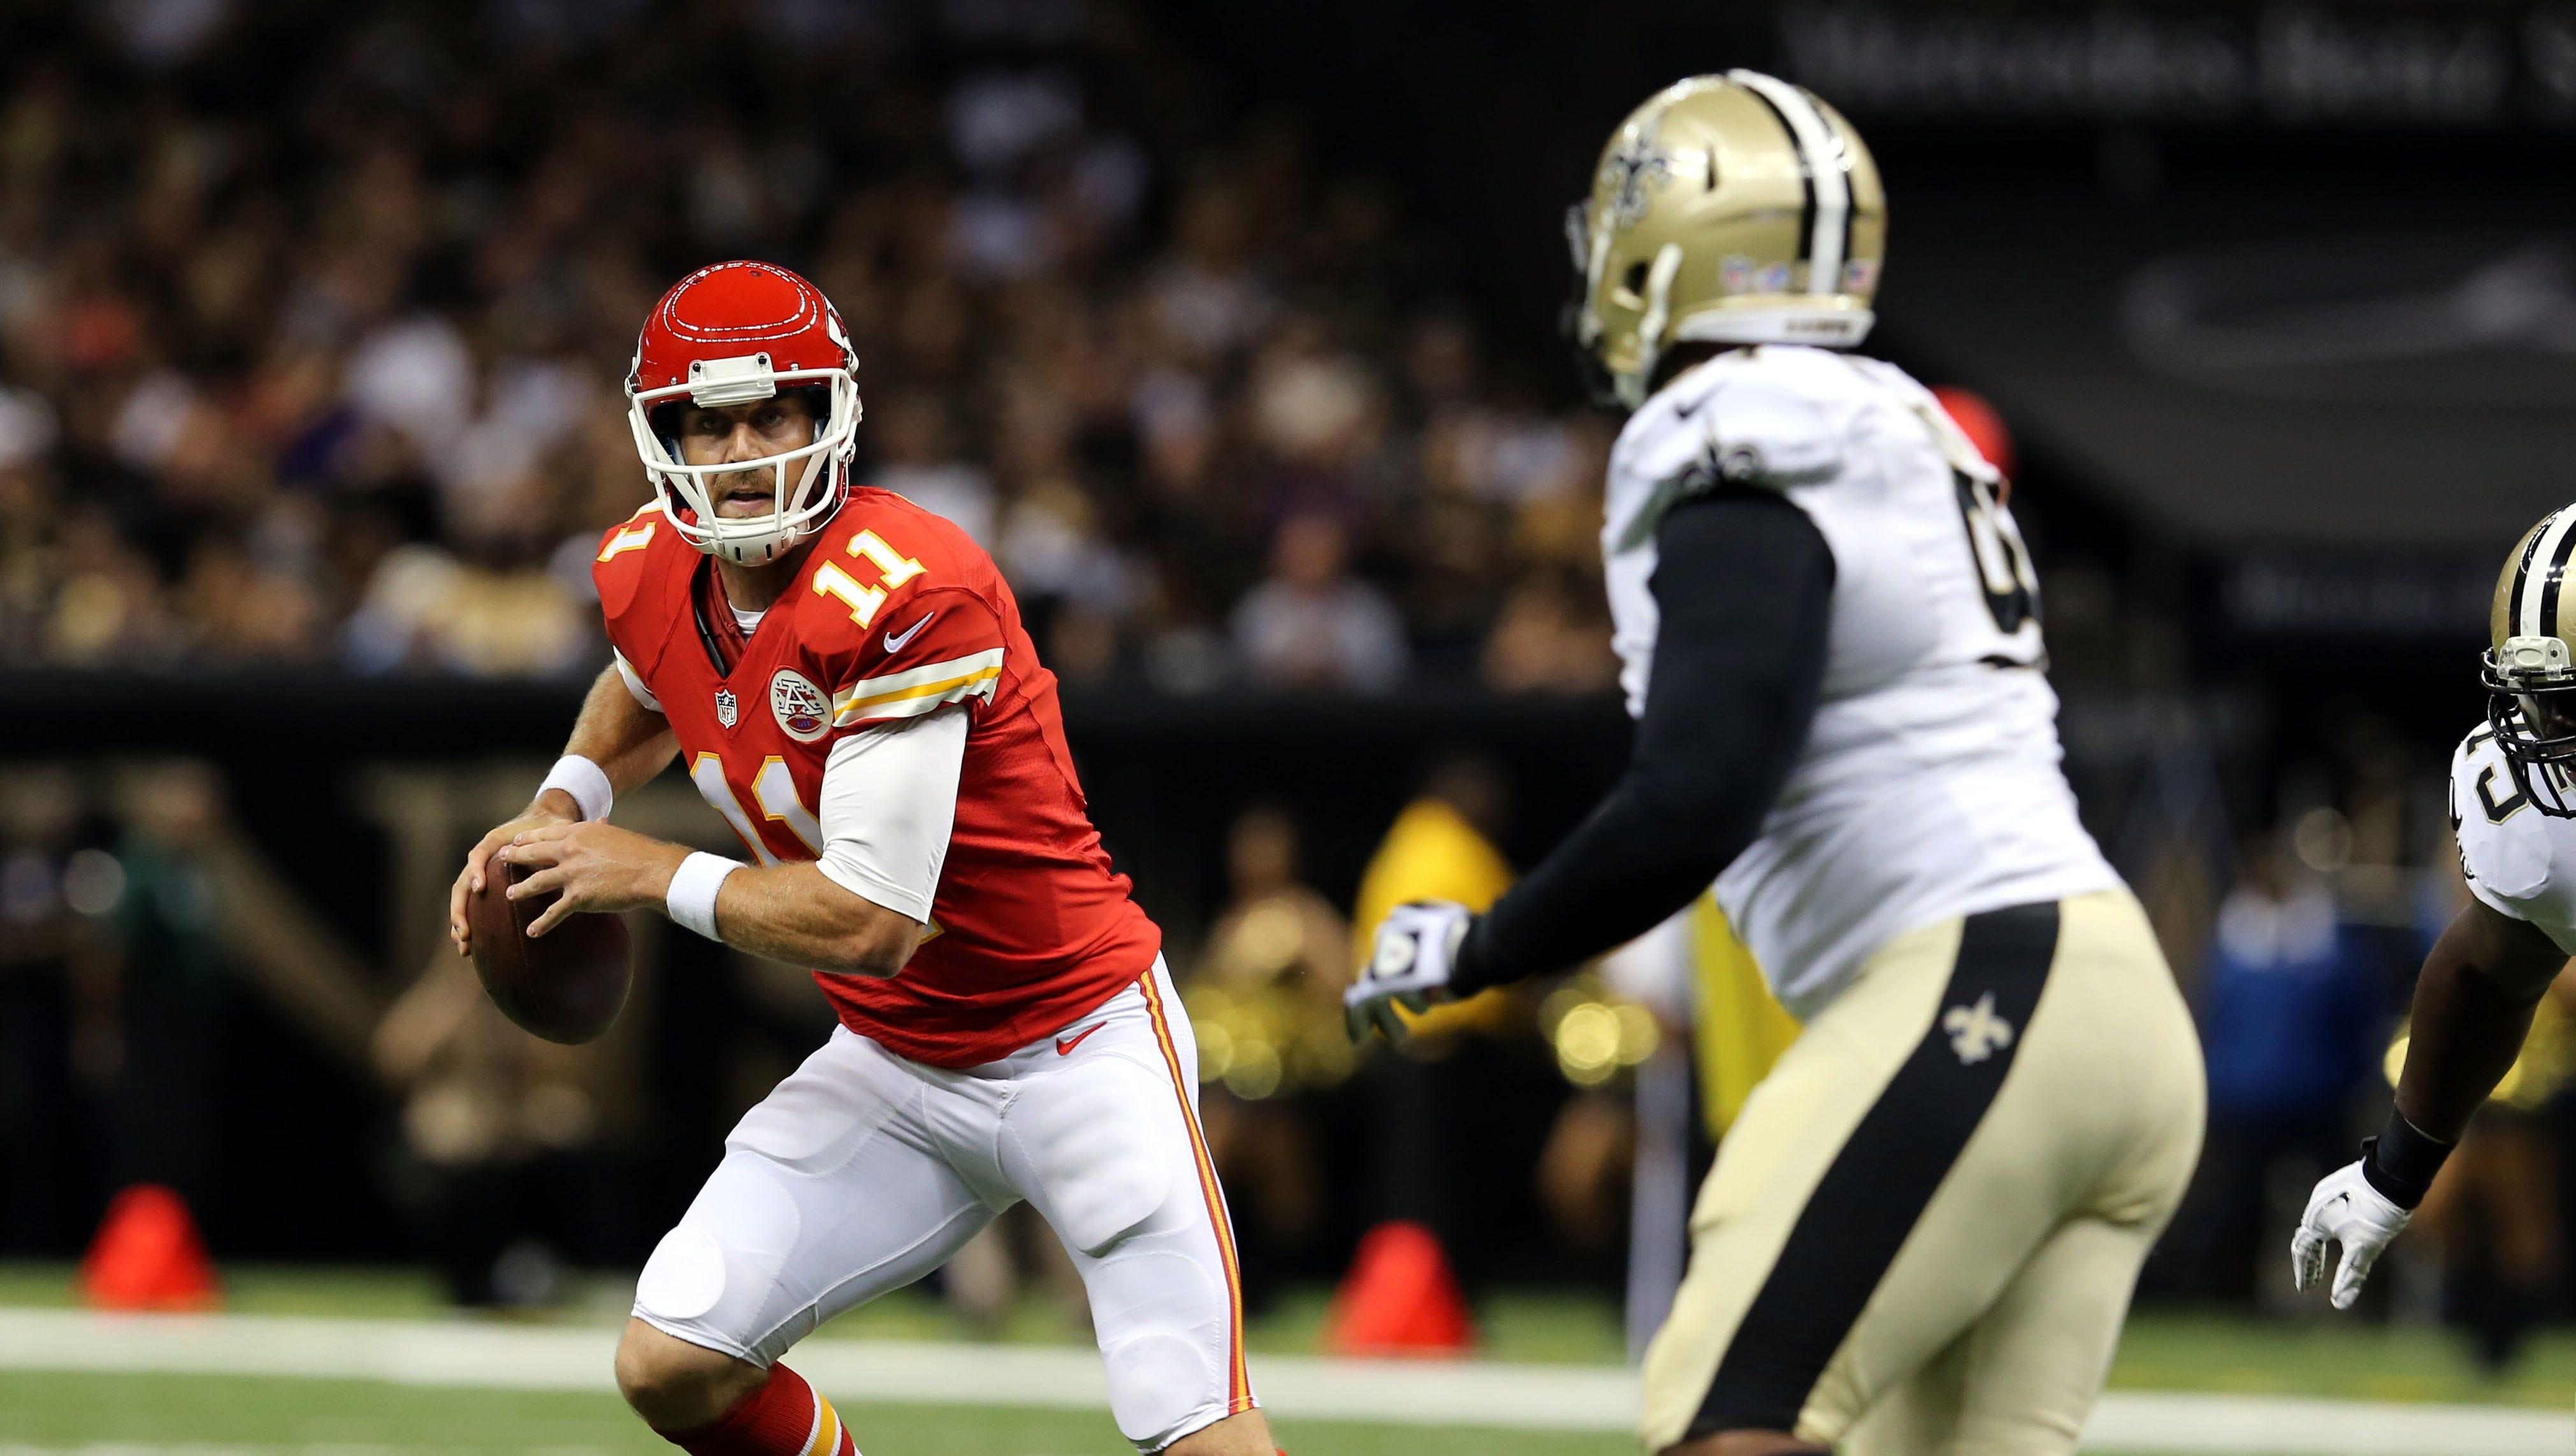 Kansas City Chiefs quarterback Alex Smith (11) rolls out while pressured by New Orleans Saints defensive end Cameron Jordan (94).